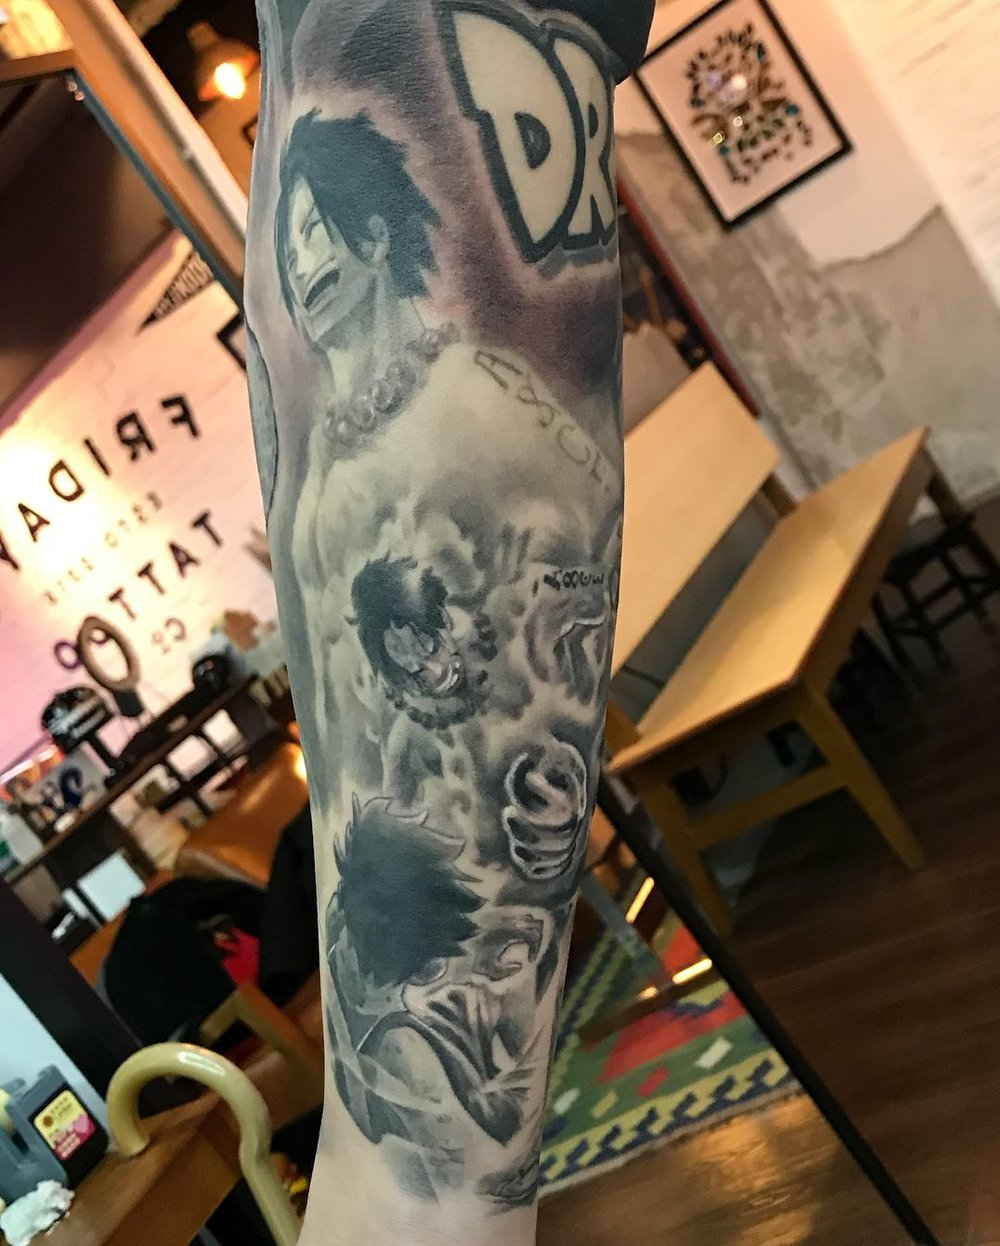 2018-fridays-tattoo-hong-kong-jamie-one-piece-dragon-ball-sleeve-5.jpg